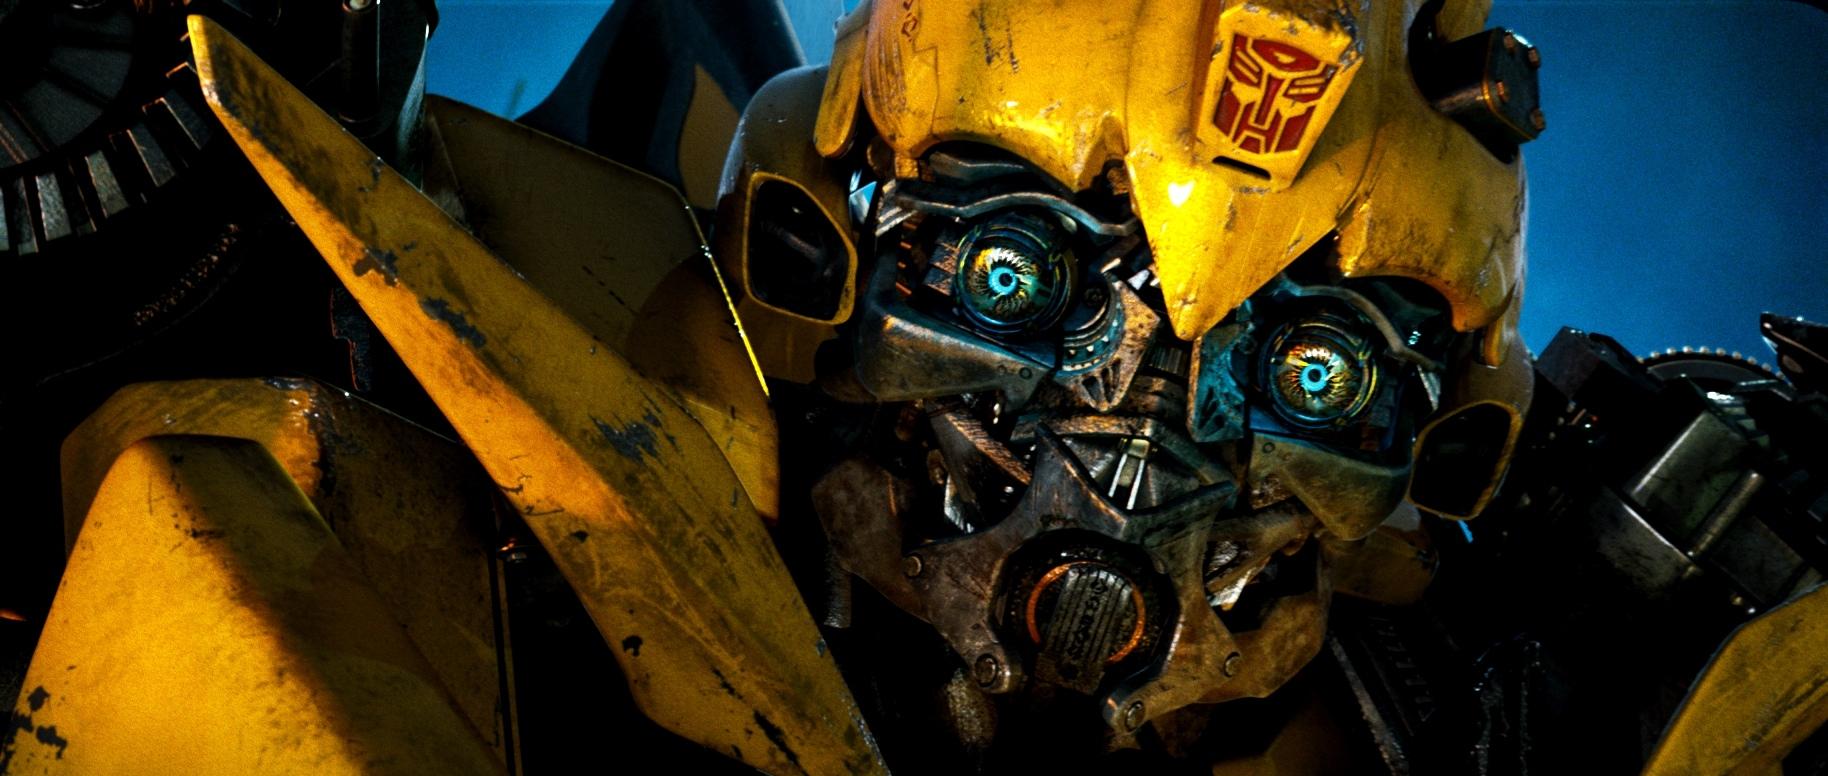 http://media.kino-govno.com/images/transformers2/transformers2_35.jpg